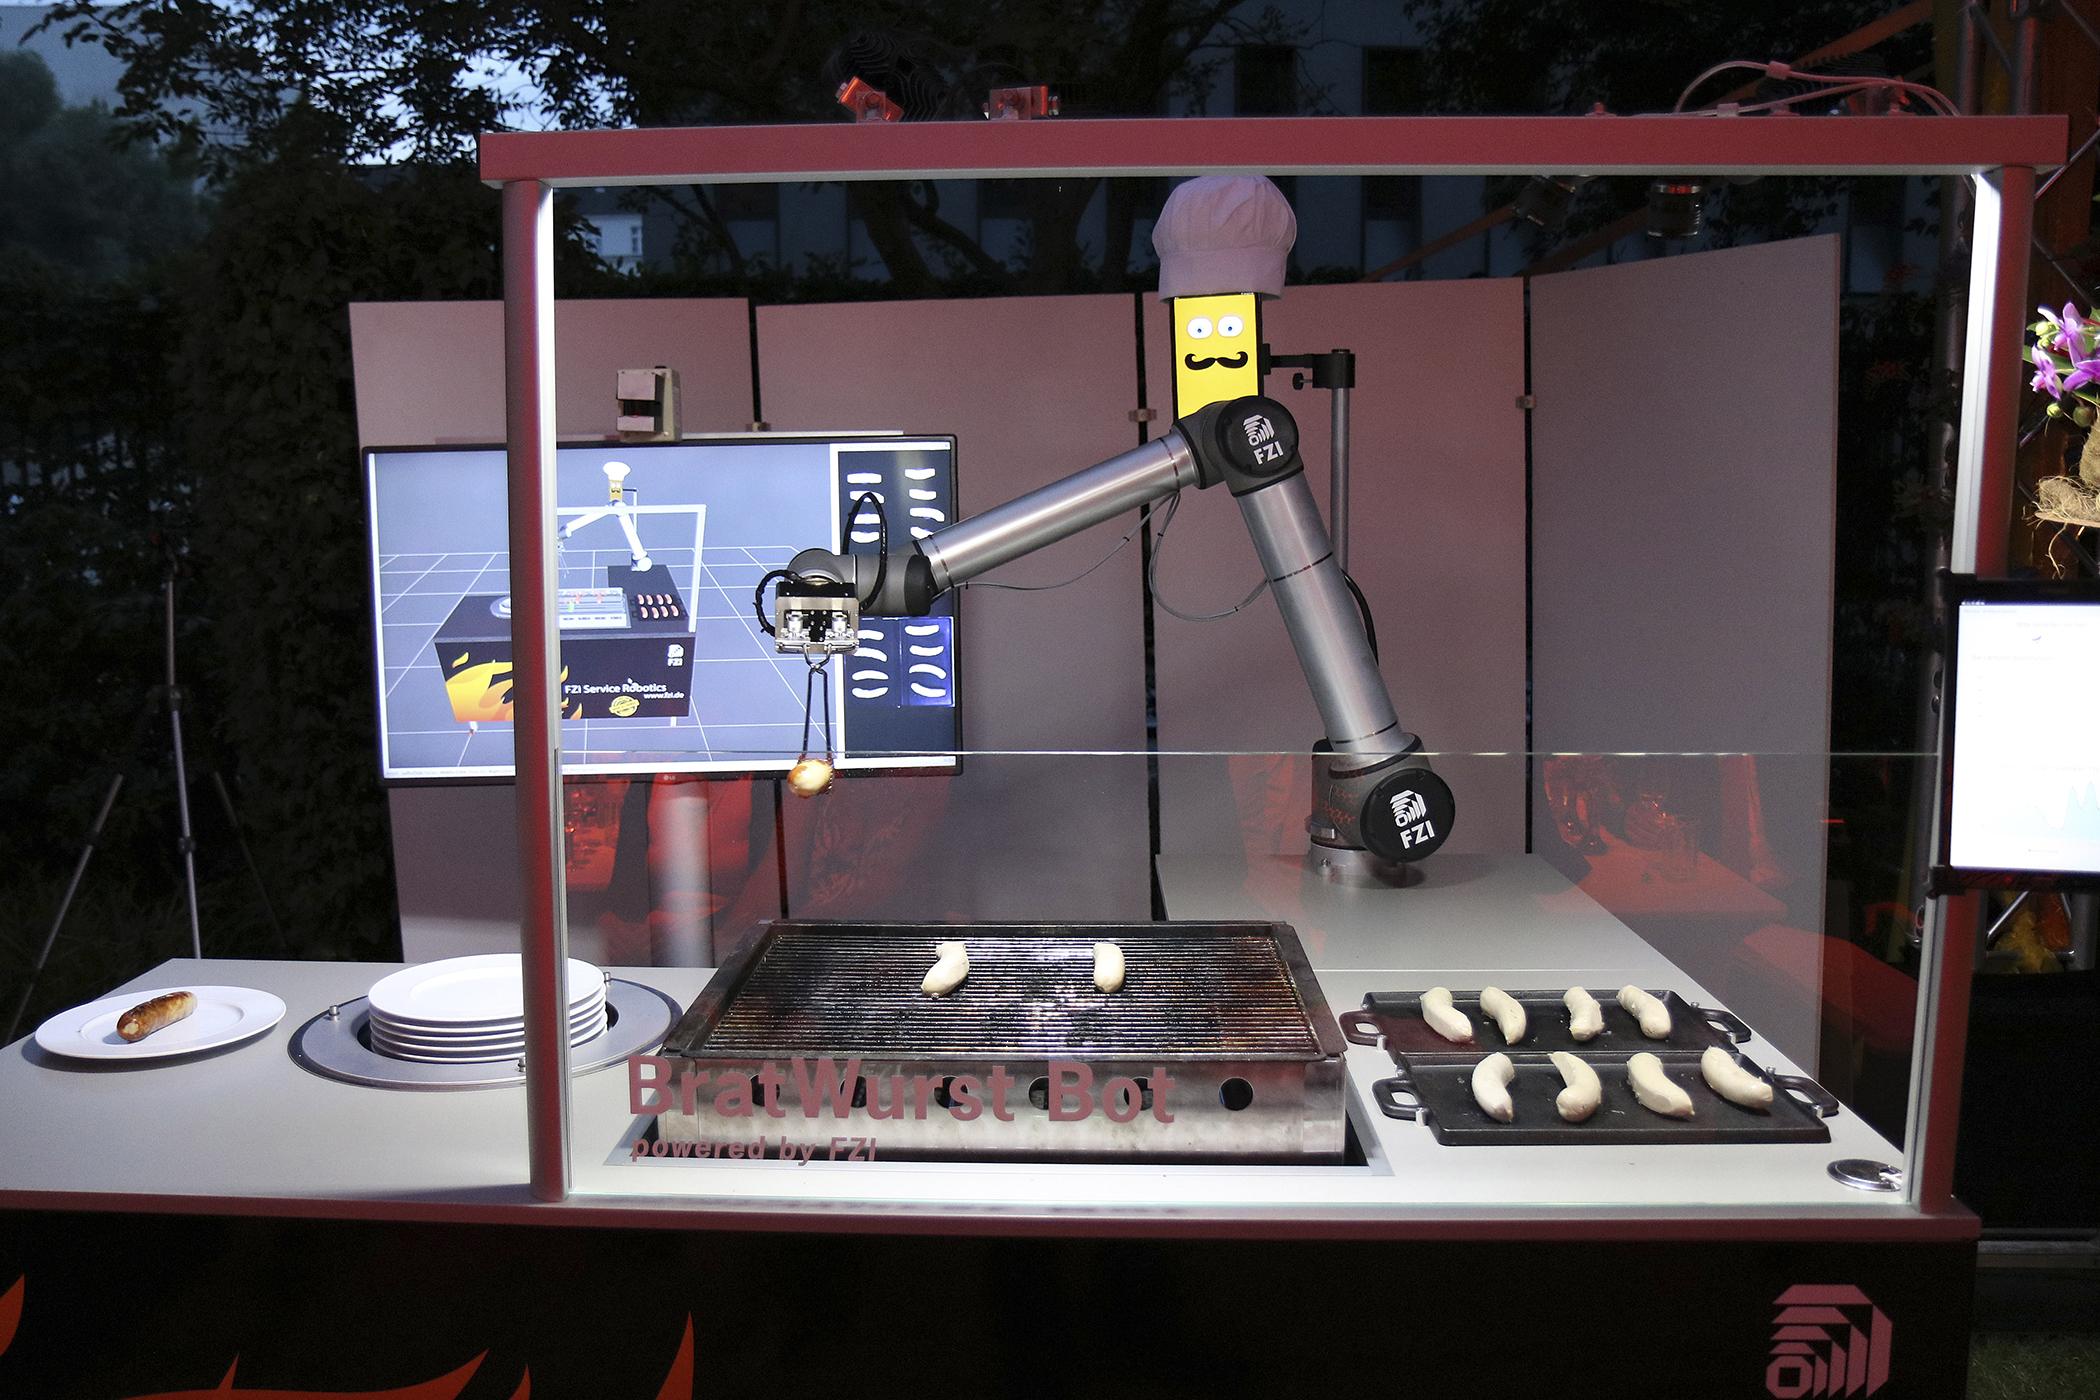 160810_GAL_Robots_Bratbot